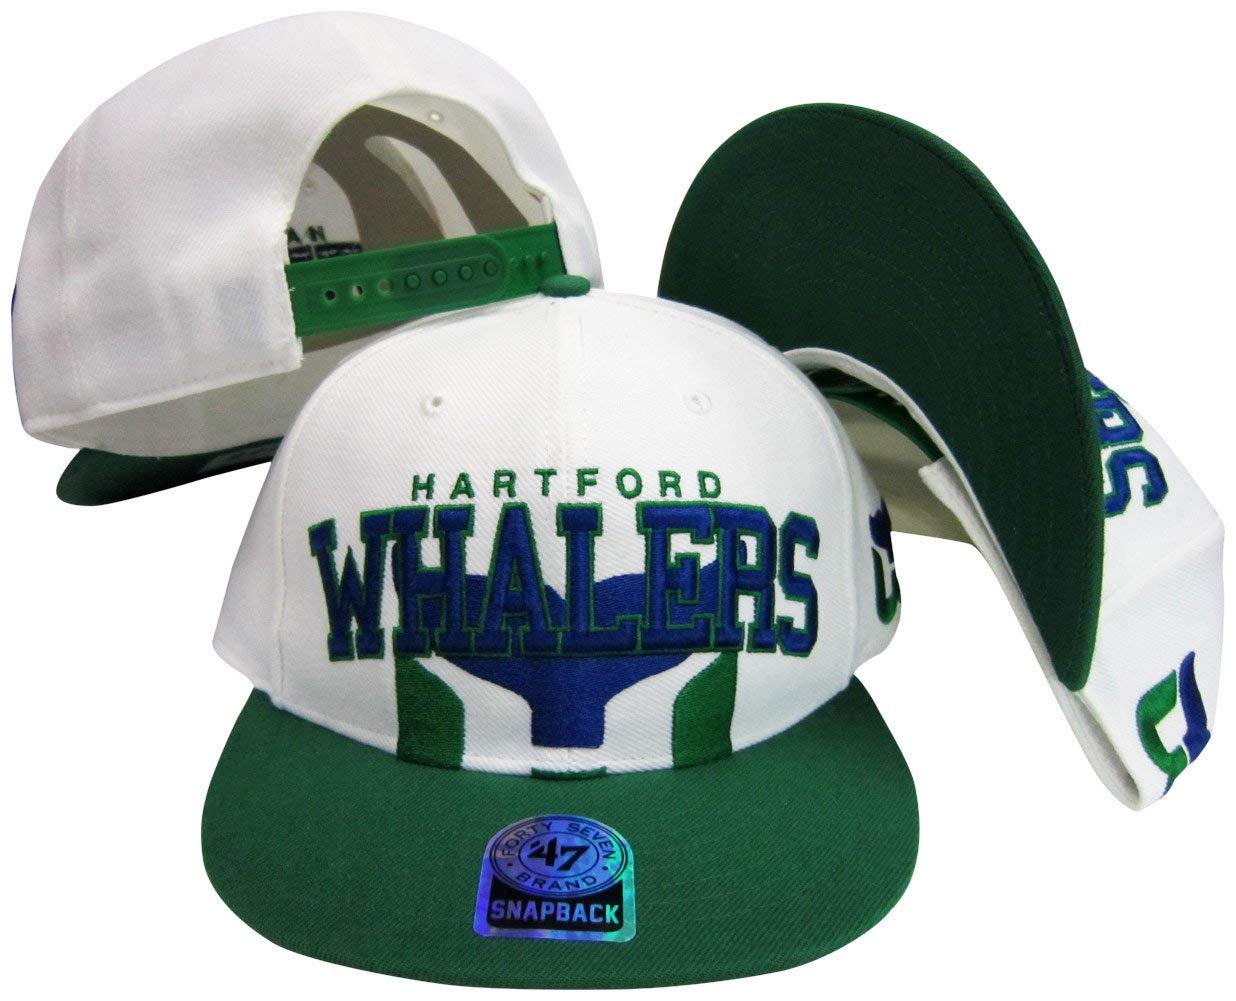 540ae172688dad Get Quotations · Hartford Whalers Two Tone Big Logo Plastic Snapback  Adjustable Plastic Snap Back Hat / Cap